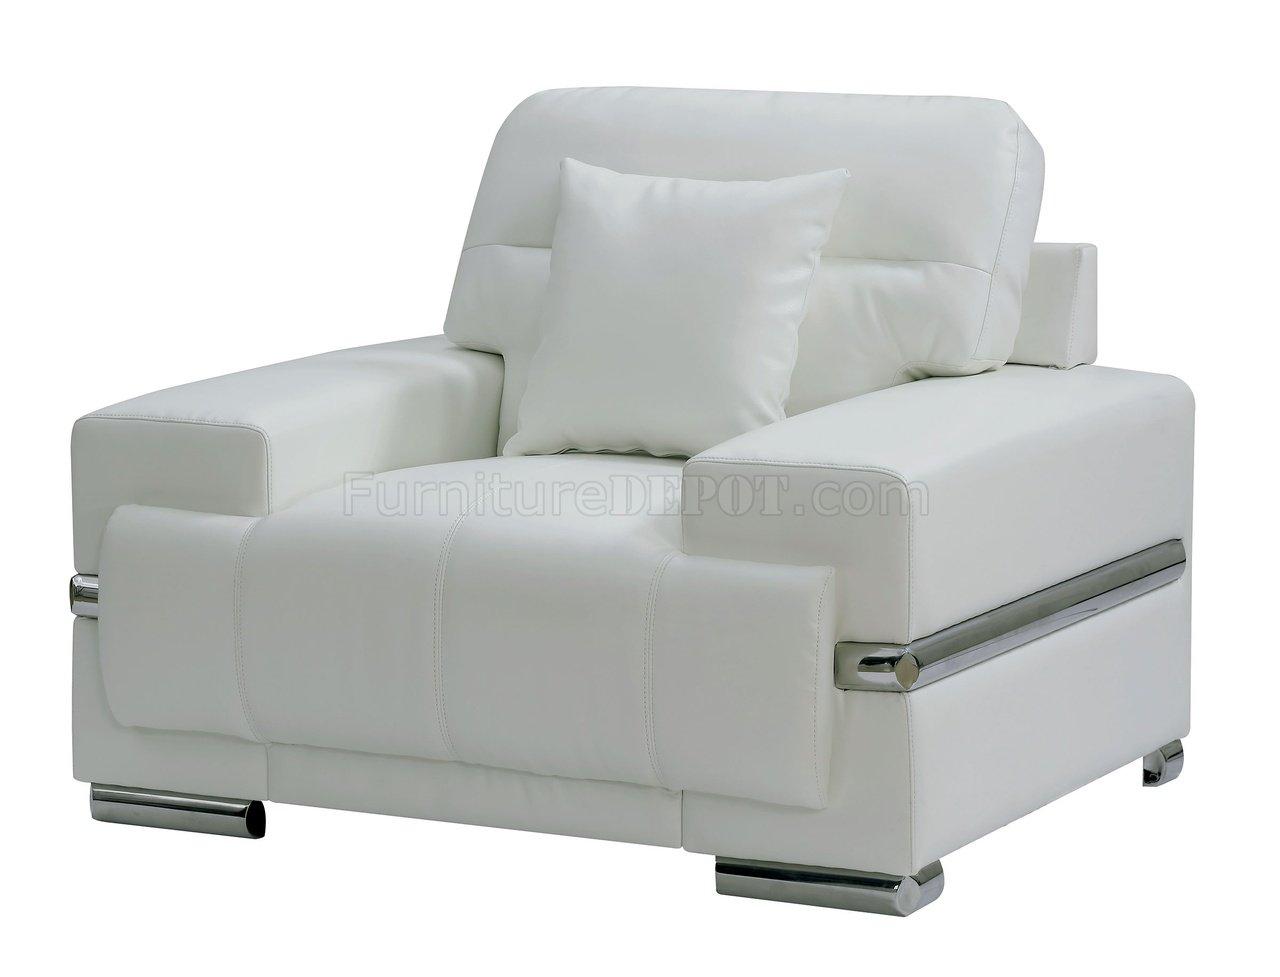 leatherette sofa durability silver velvet dfs zibak cm6411wh in white w options